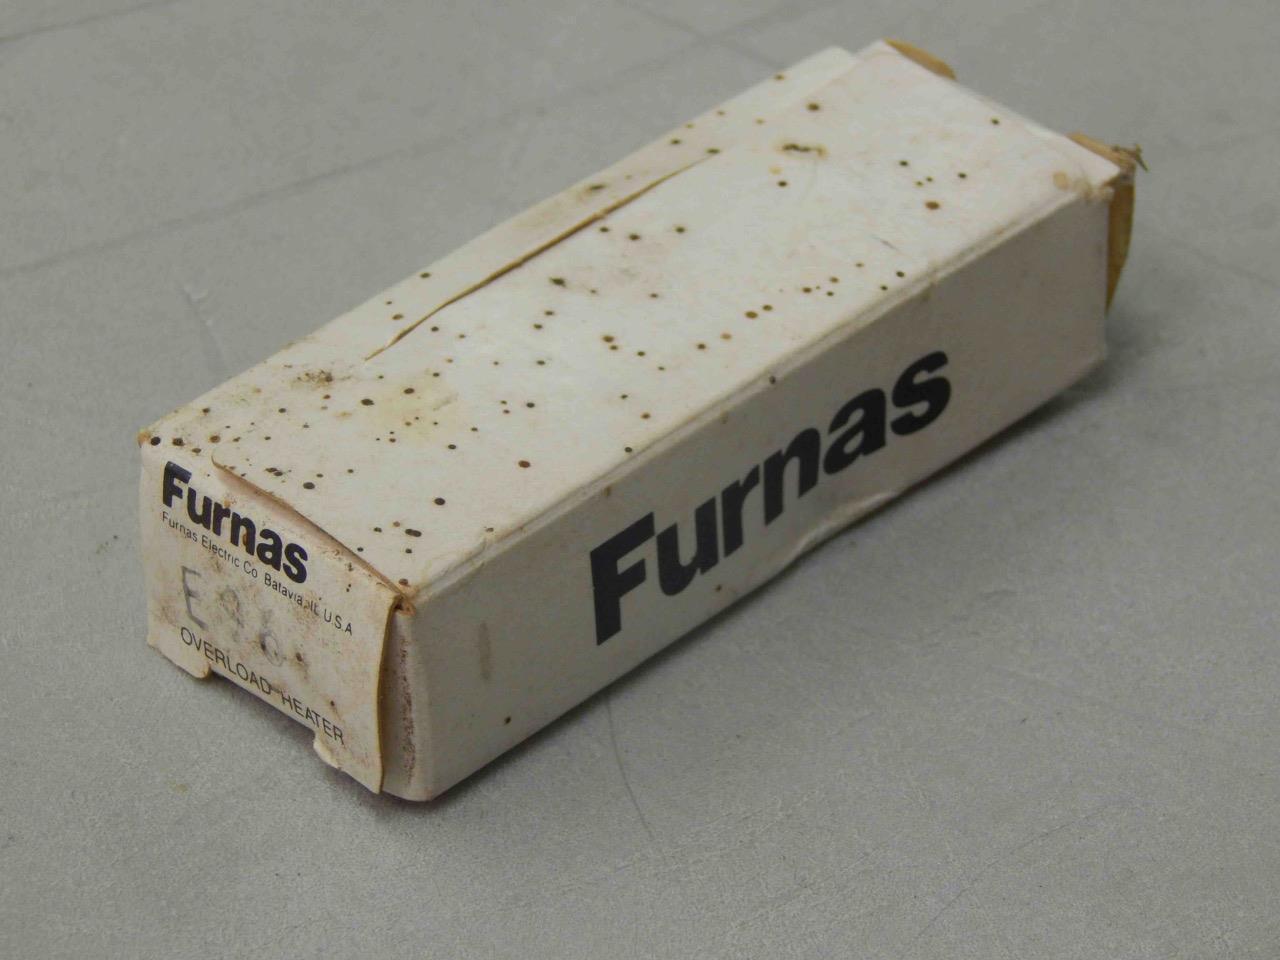 84 Furnas E96 Overload Heater Heating Element Gtnew Mc